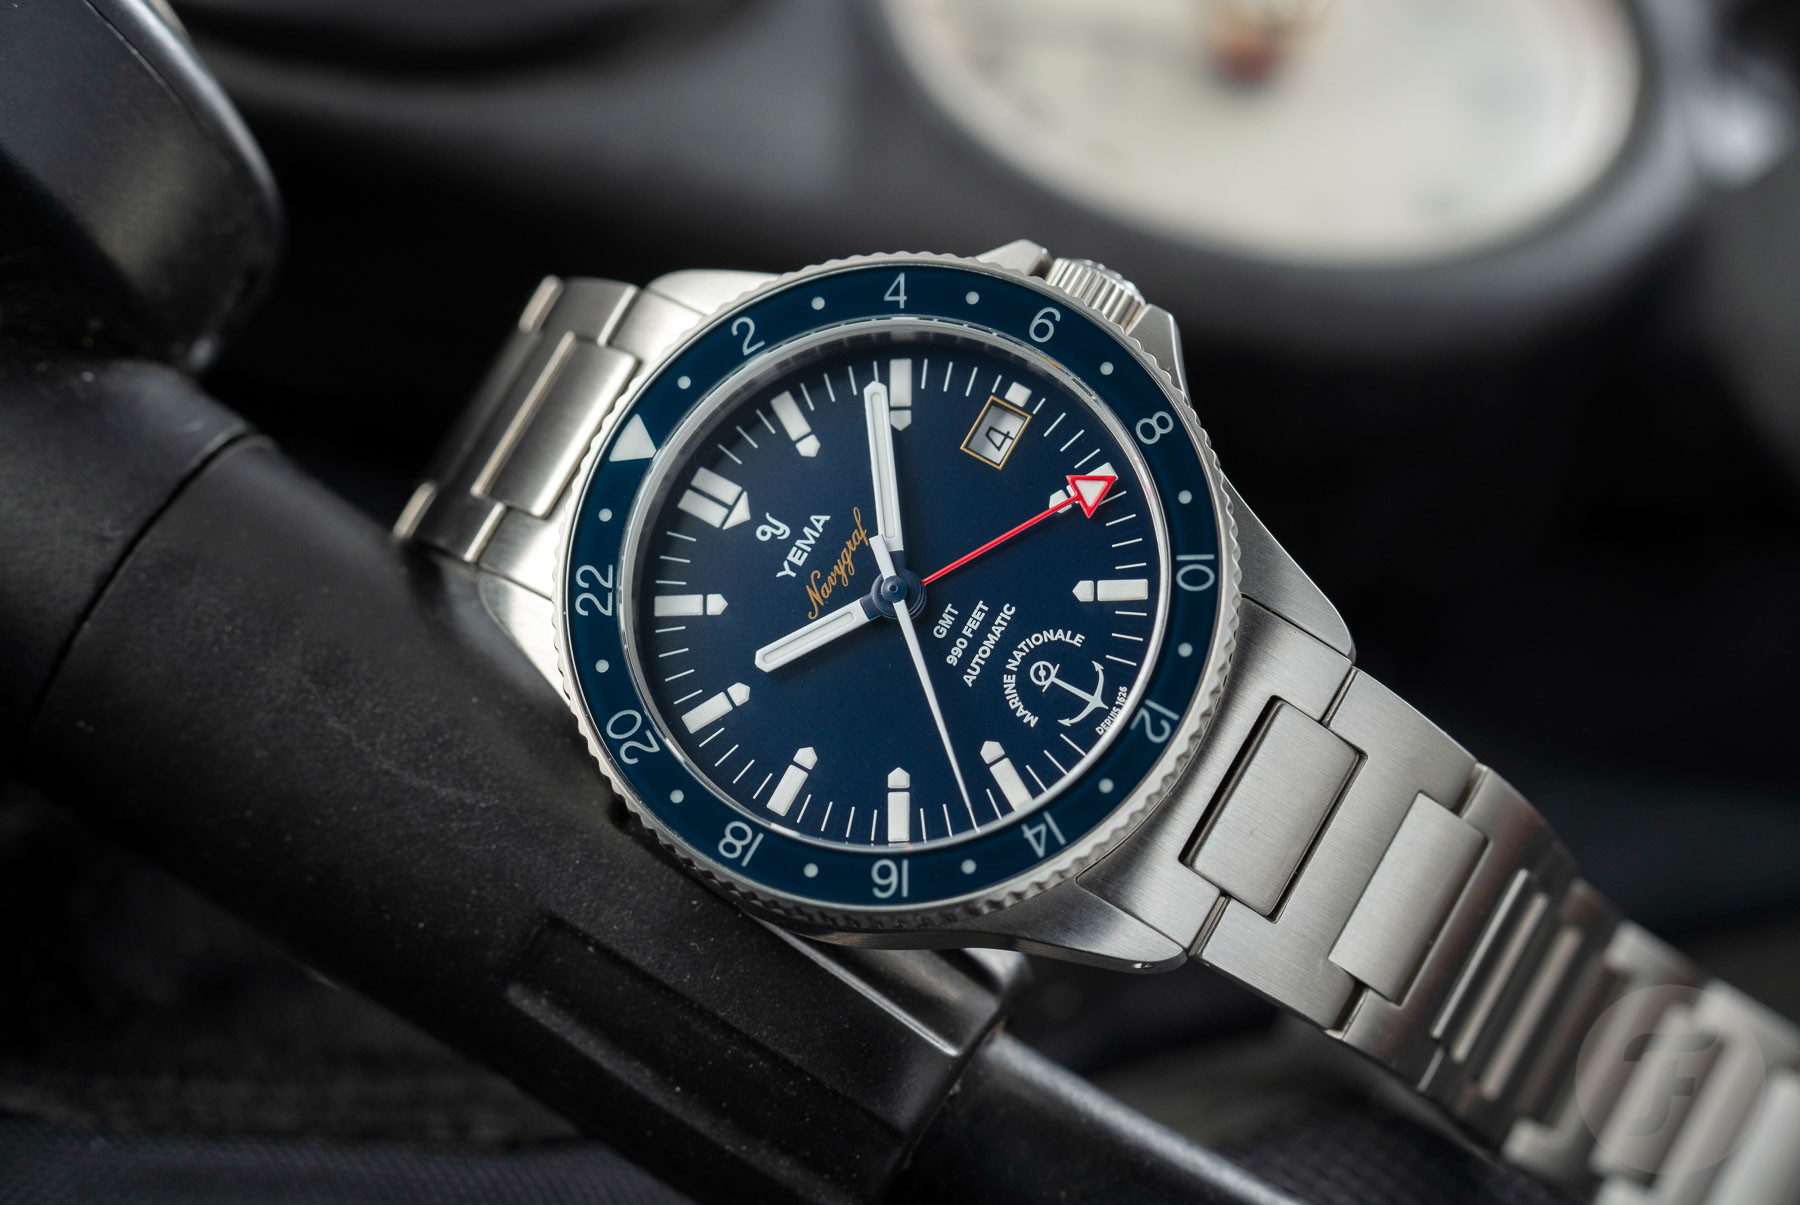 YEMA Navygraf Marine Nationale GMT Limited Edition Watch